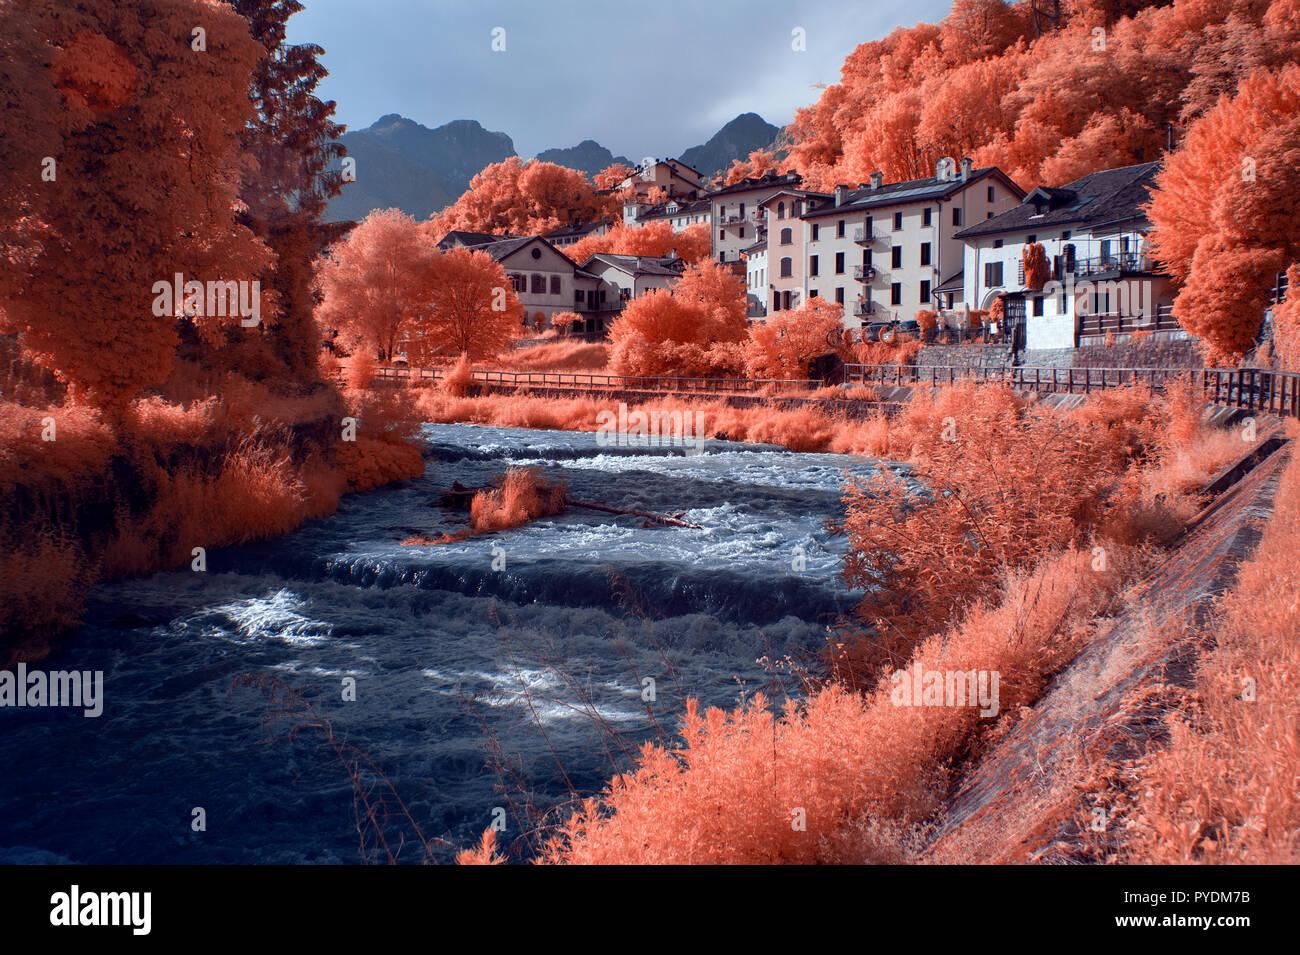 Torrente Ardo - Belluno _ Infrared - Dolomites - Italy - Stock Image